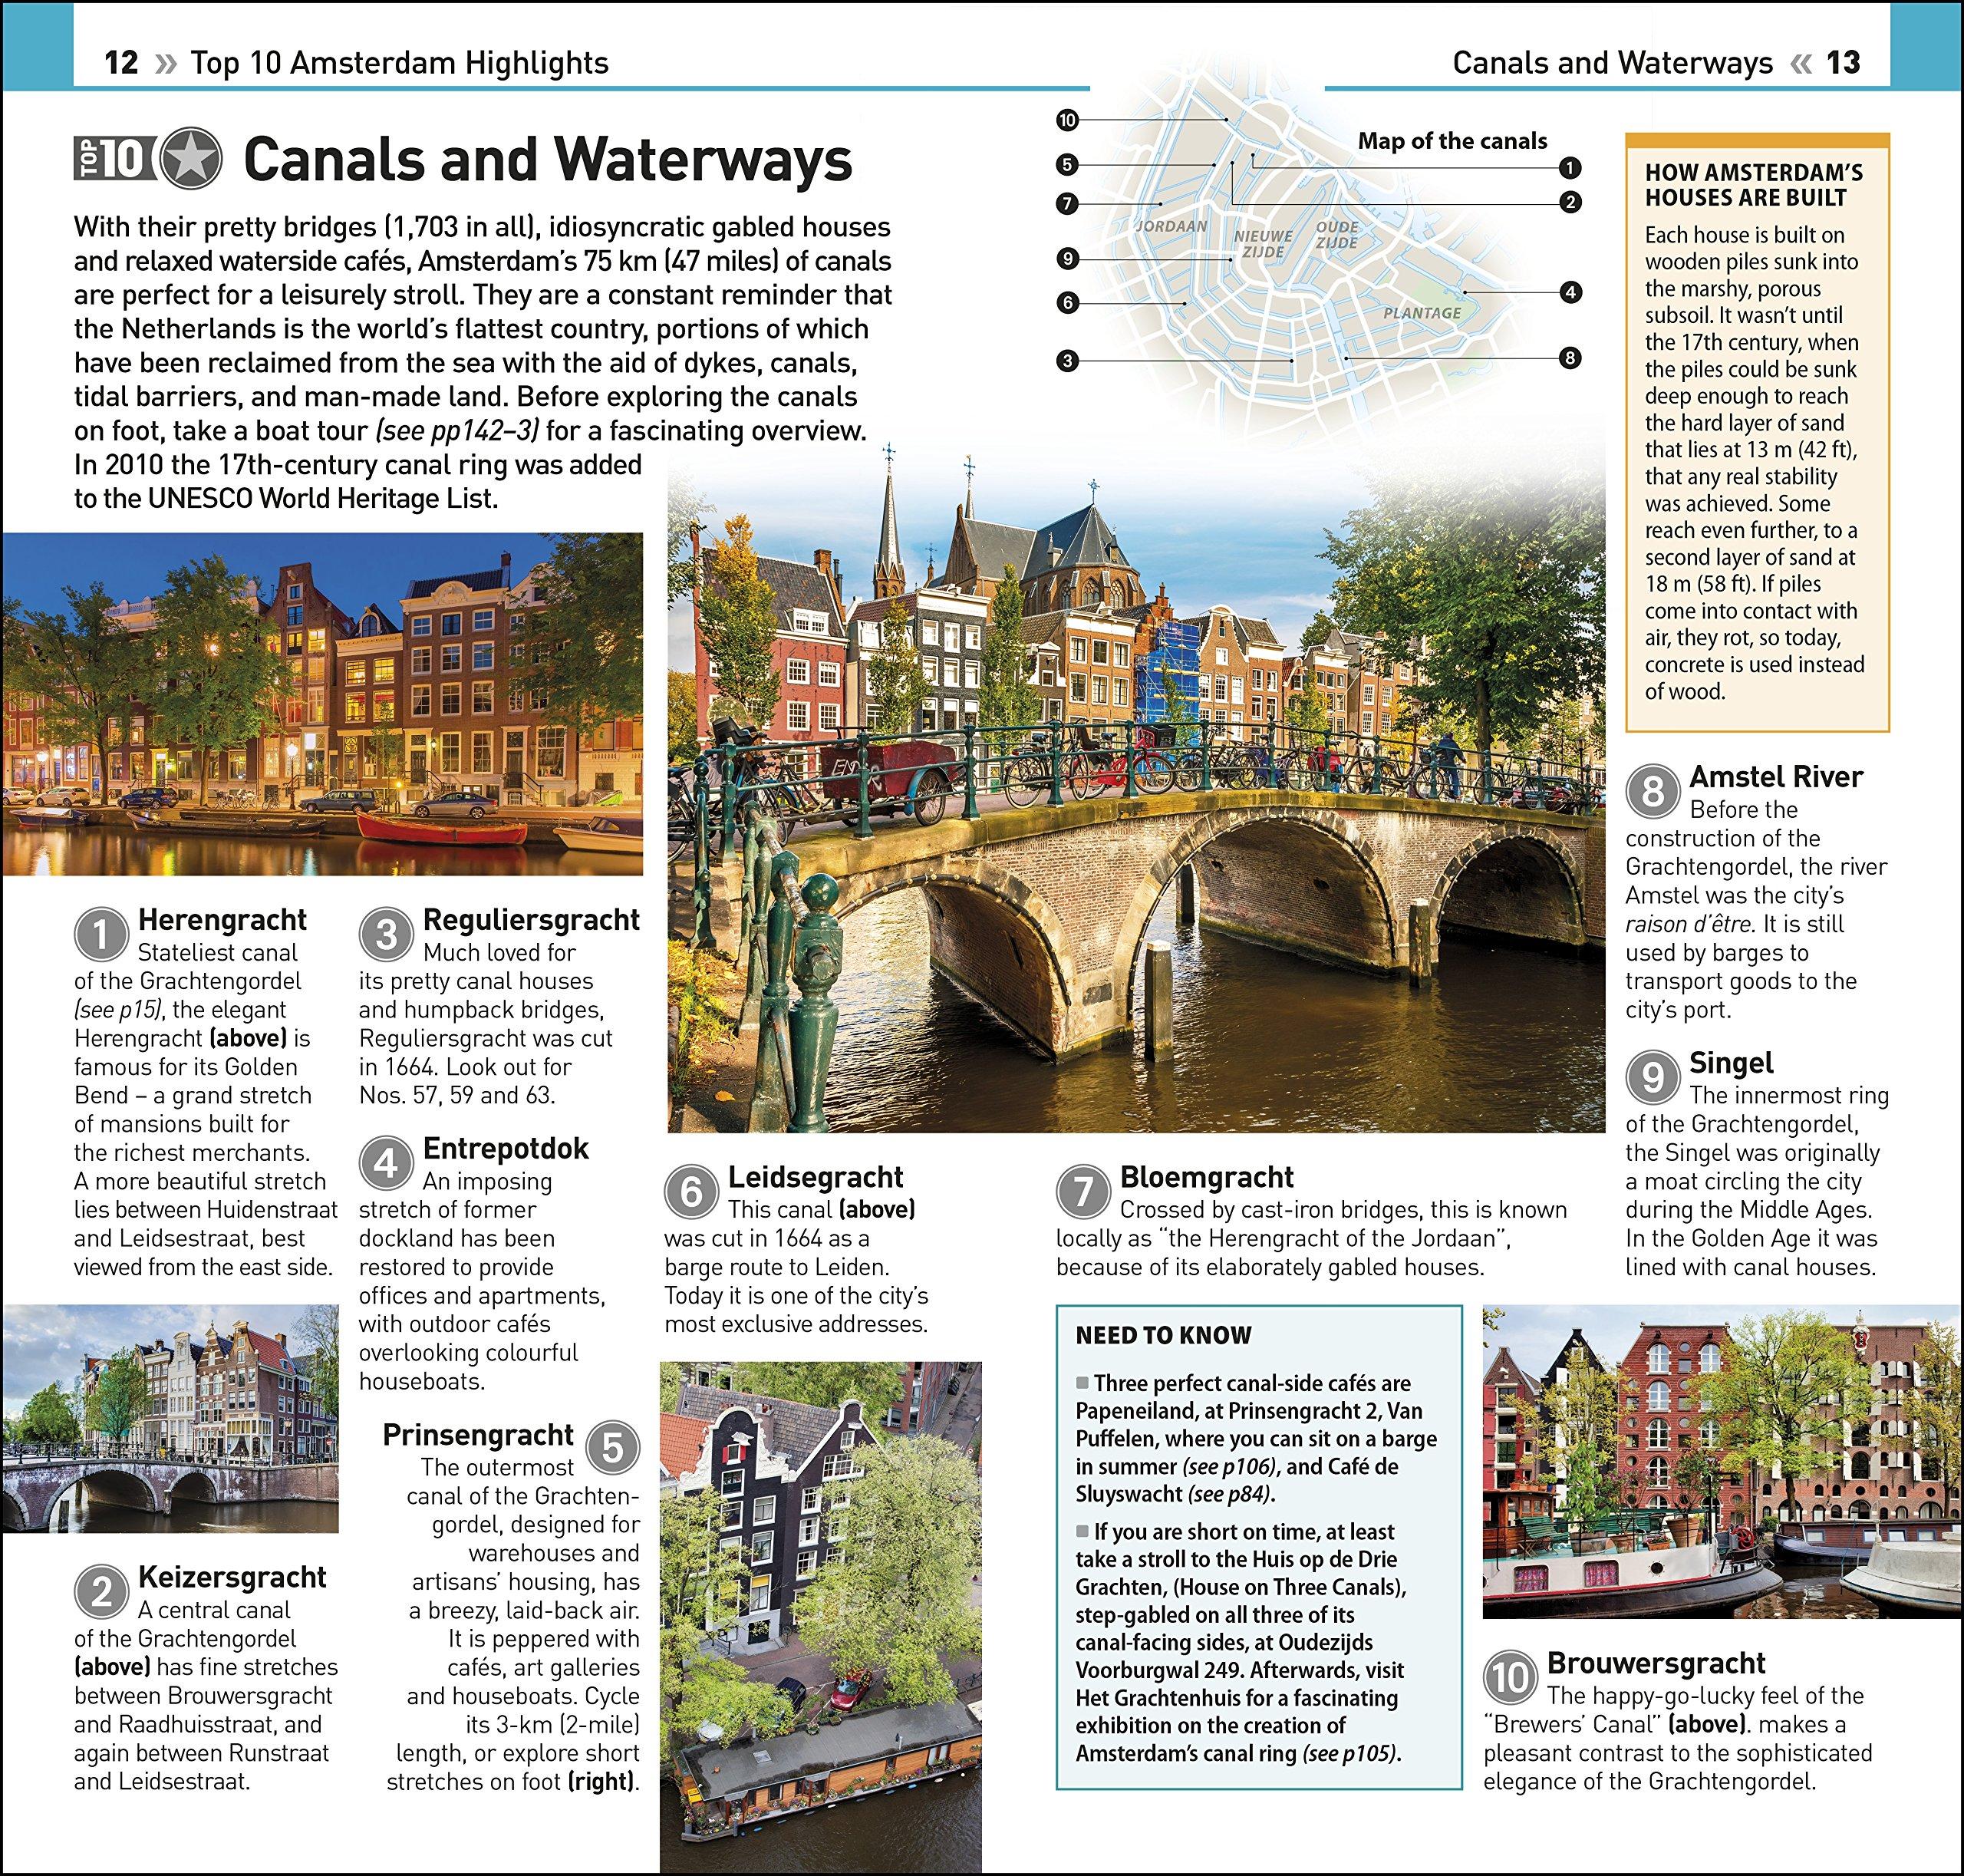 Top 10 Amsterdam (DK Eyewitness Travel Guide): DK Travel (author):  9780241310618: Amazon.com: Books